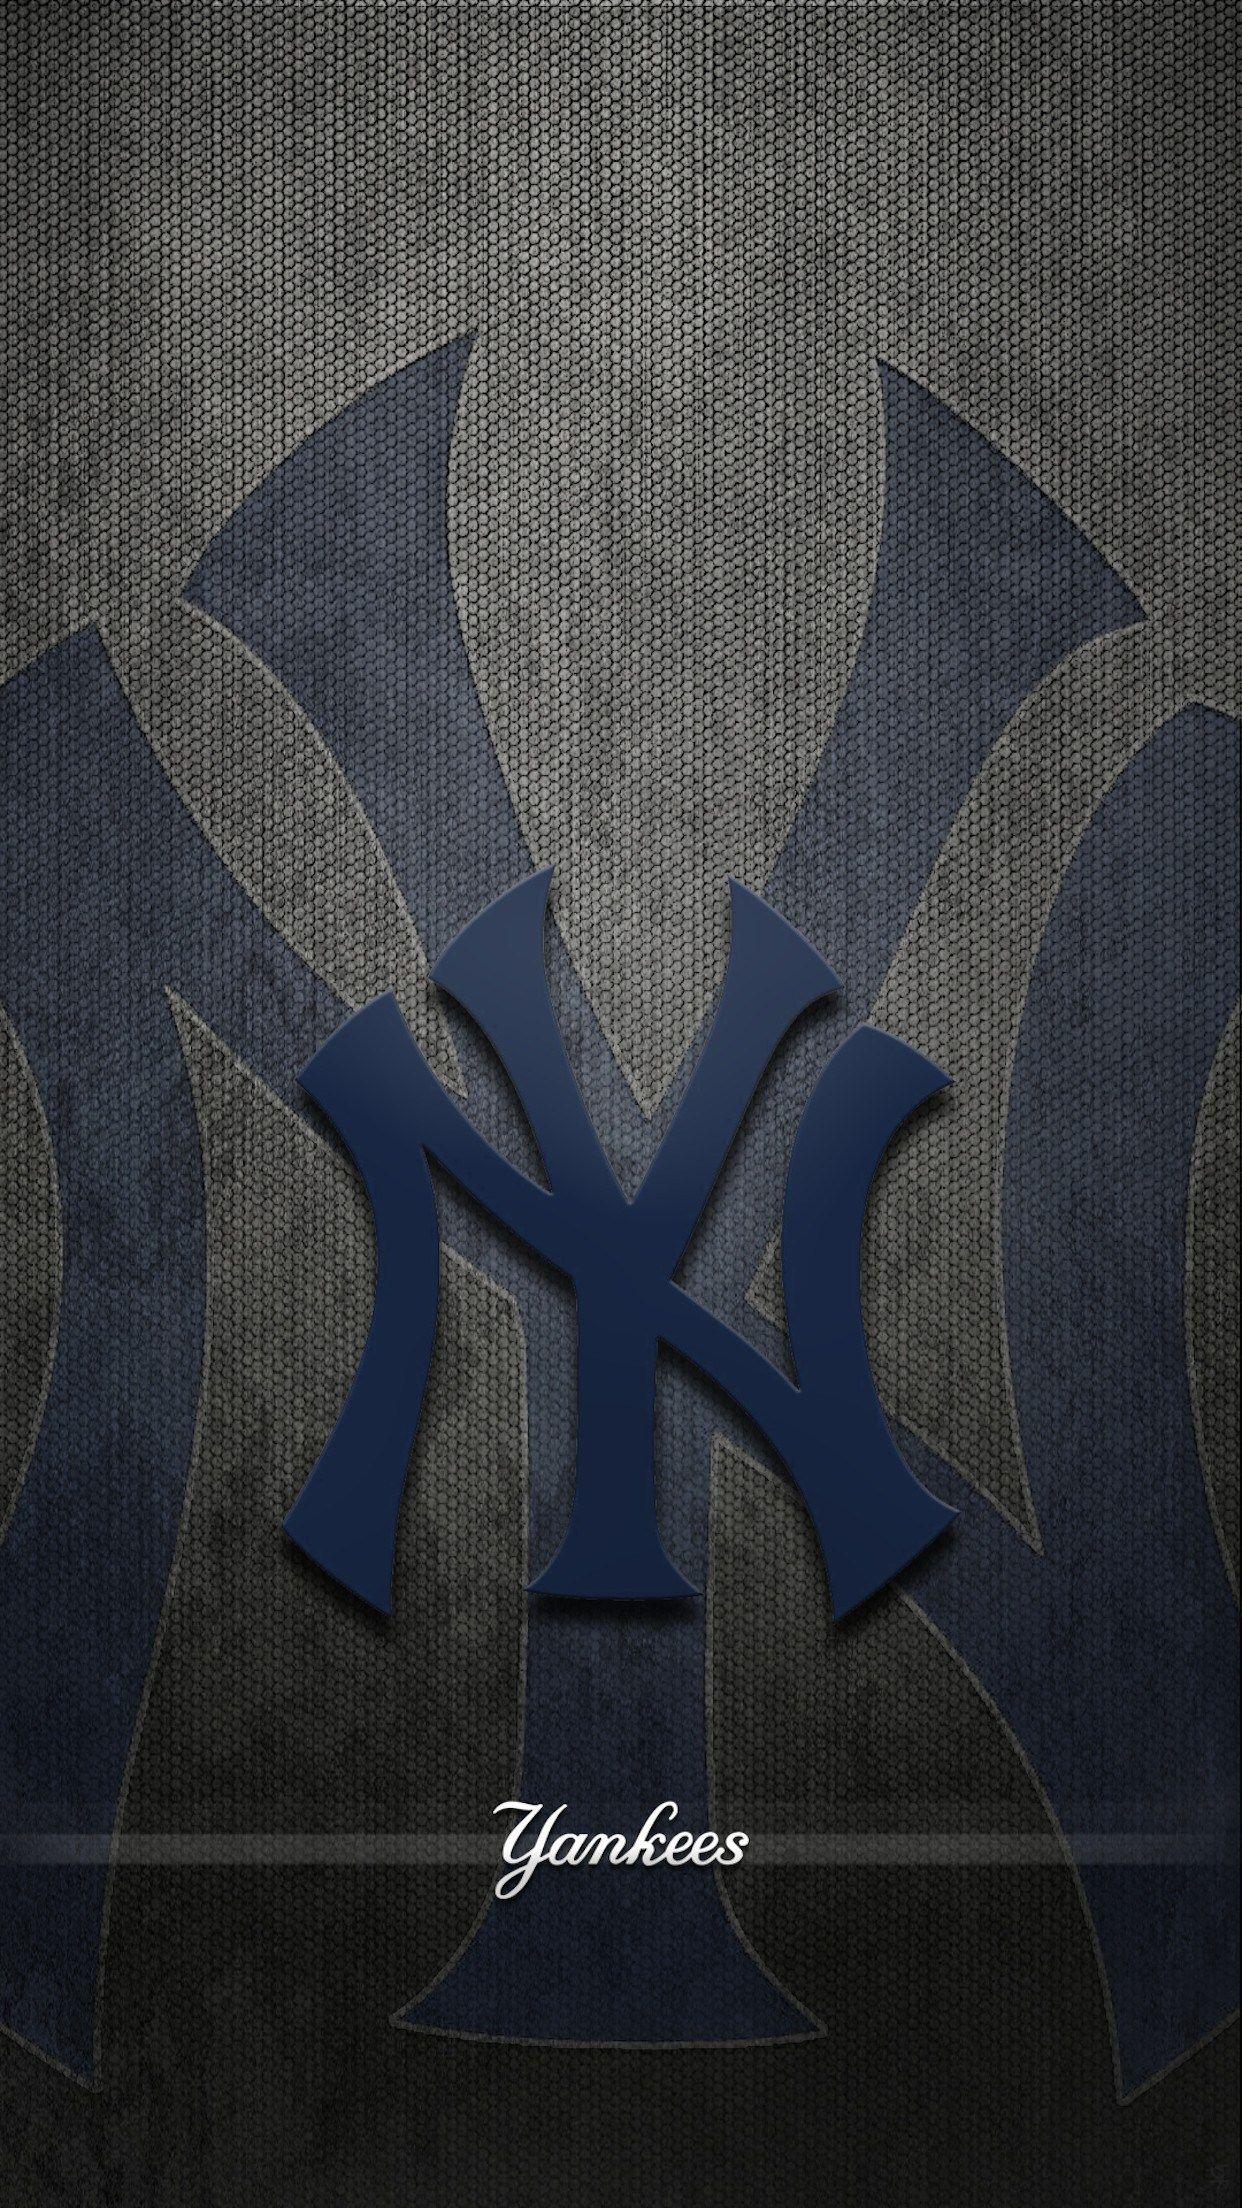 iPhone 6 7 Plus Wallpaper Request Thread Page 121 Yankees De Nueva York 7f422dac02eeb